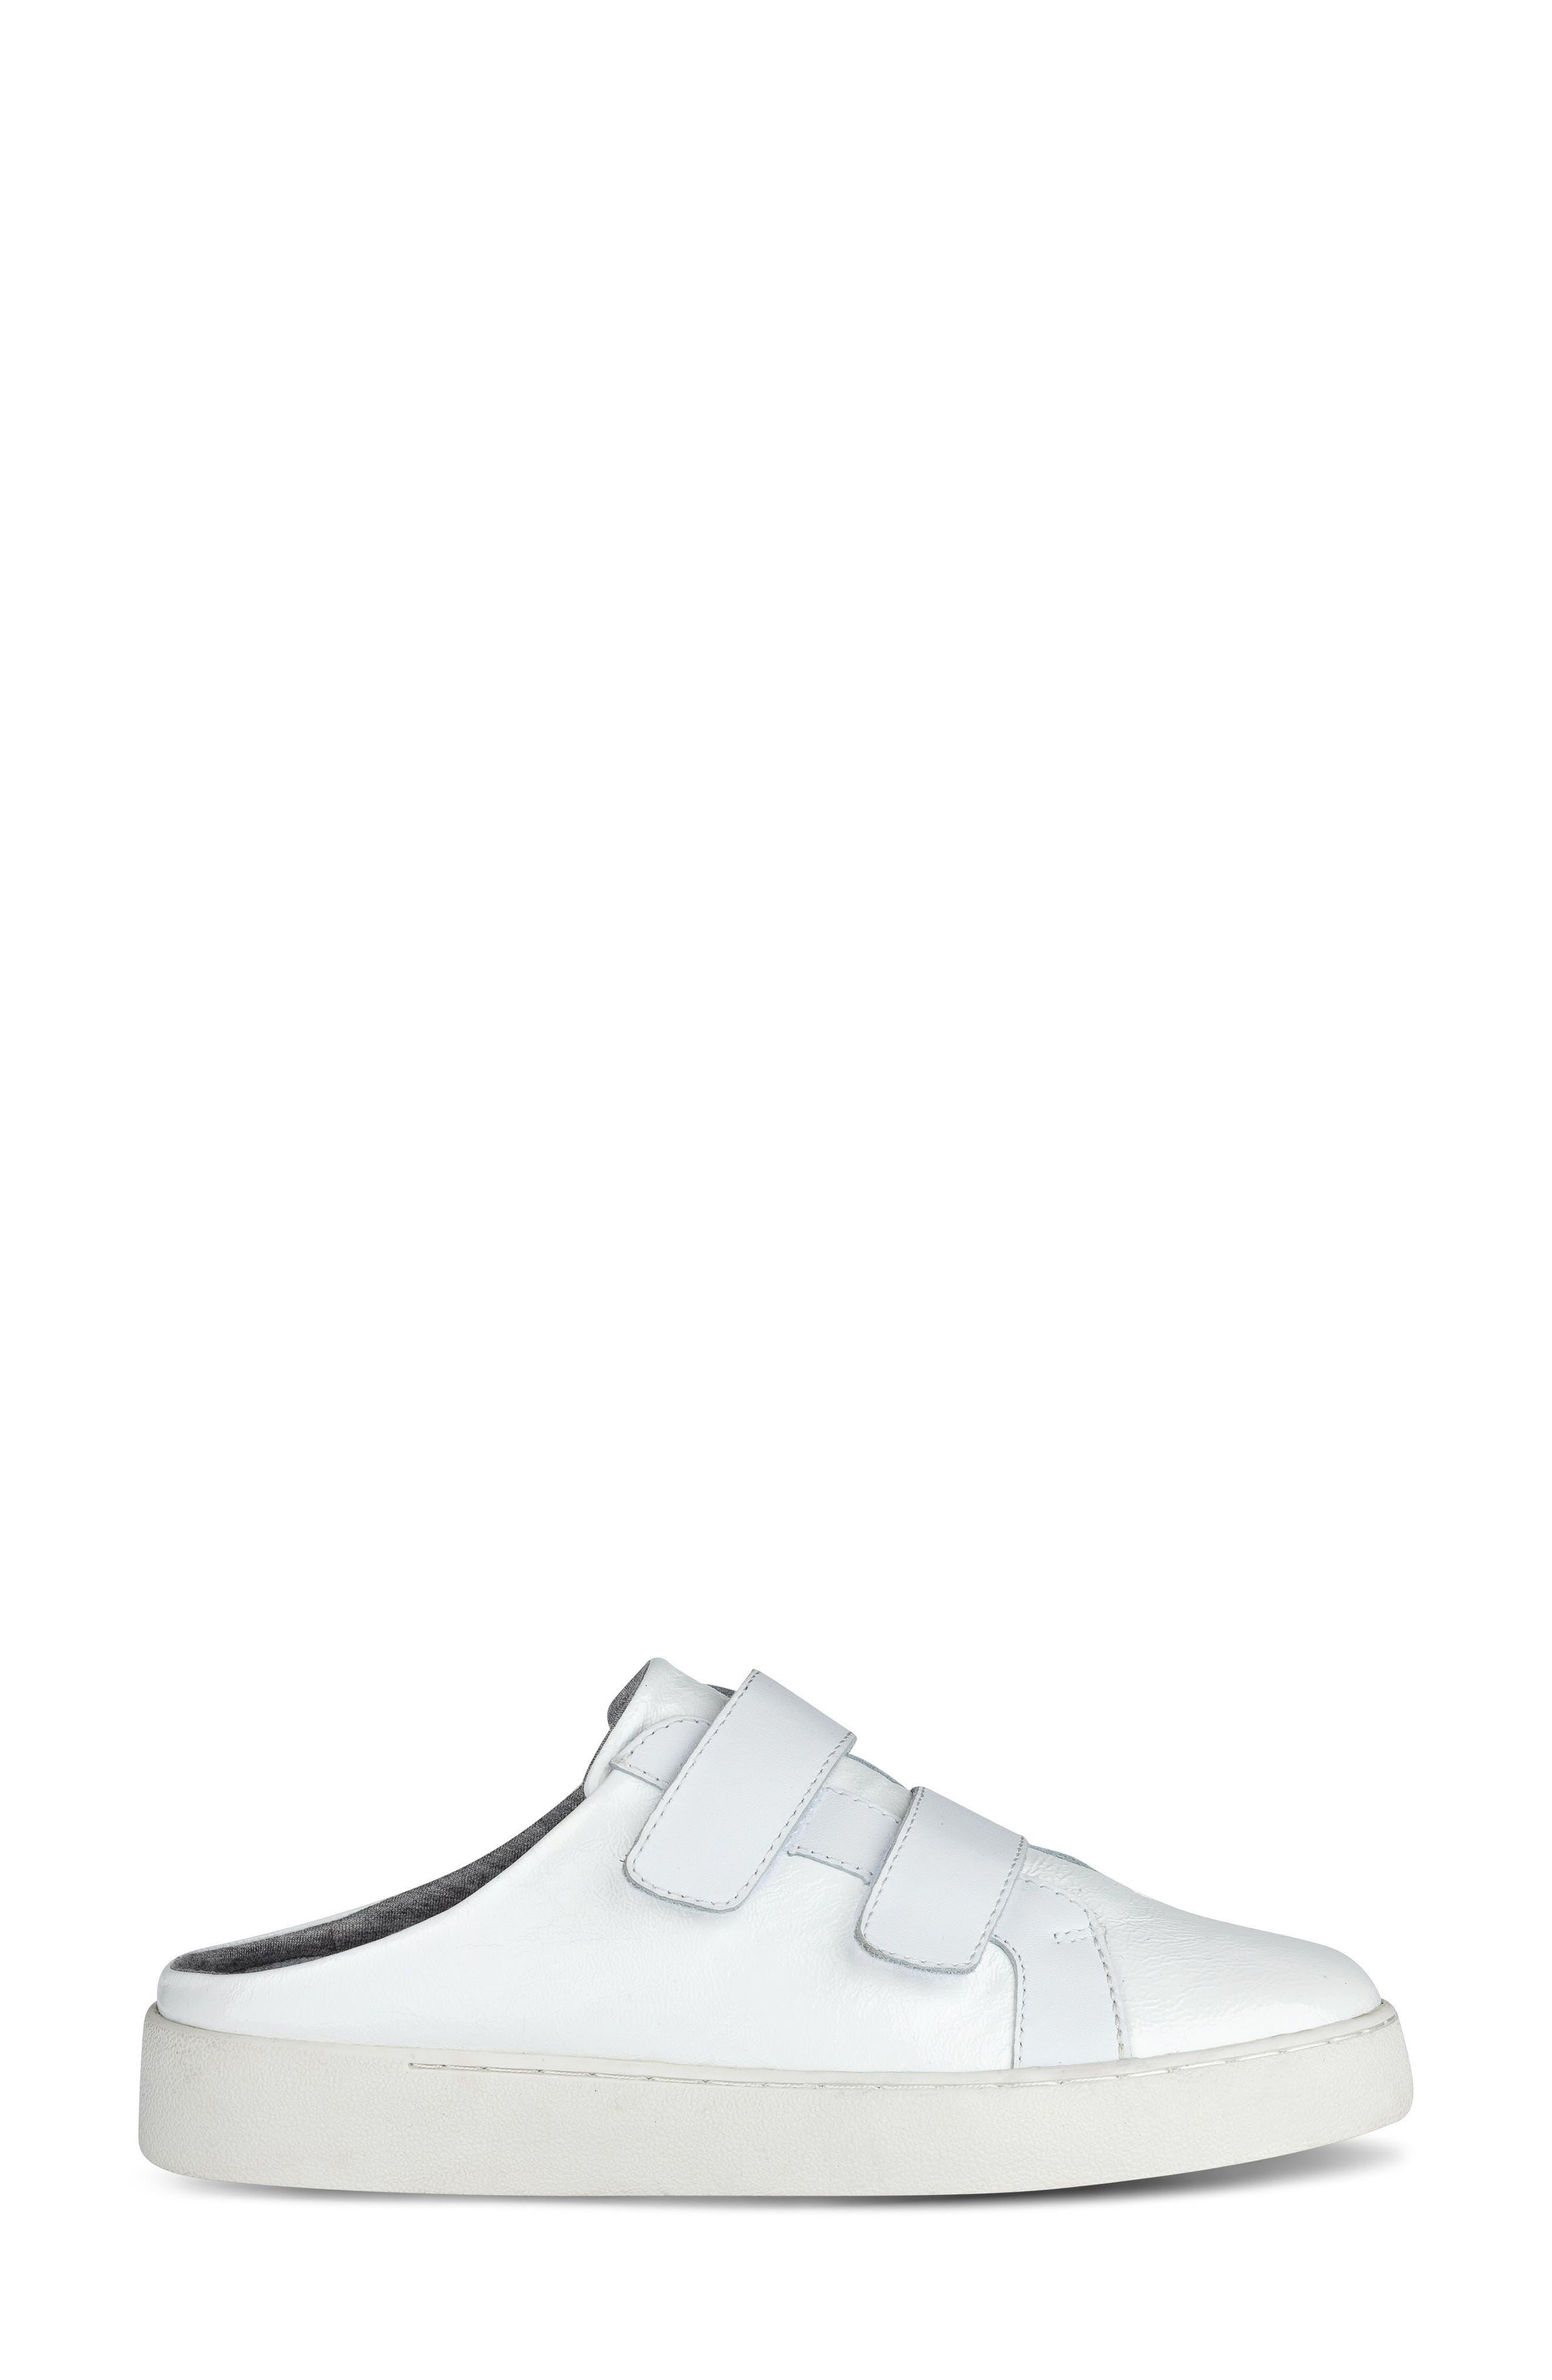 Poeton Sneaker Mule,                             Alternate thumbnail 6, color,